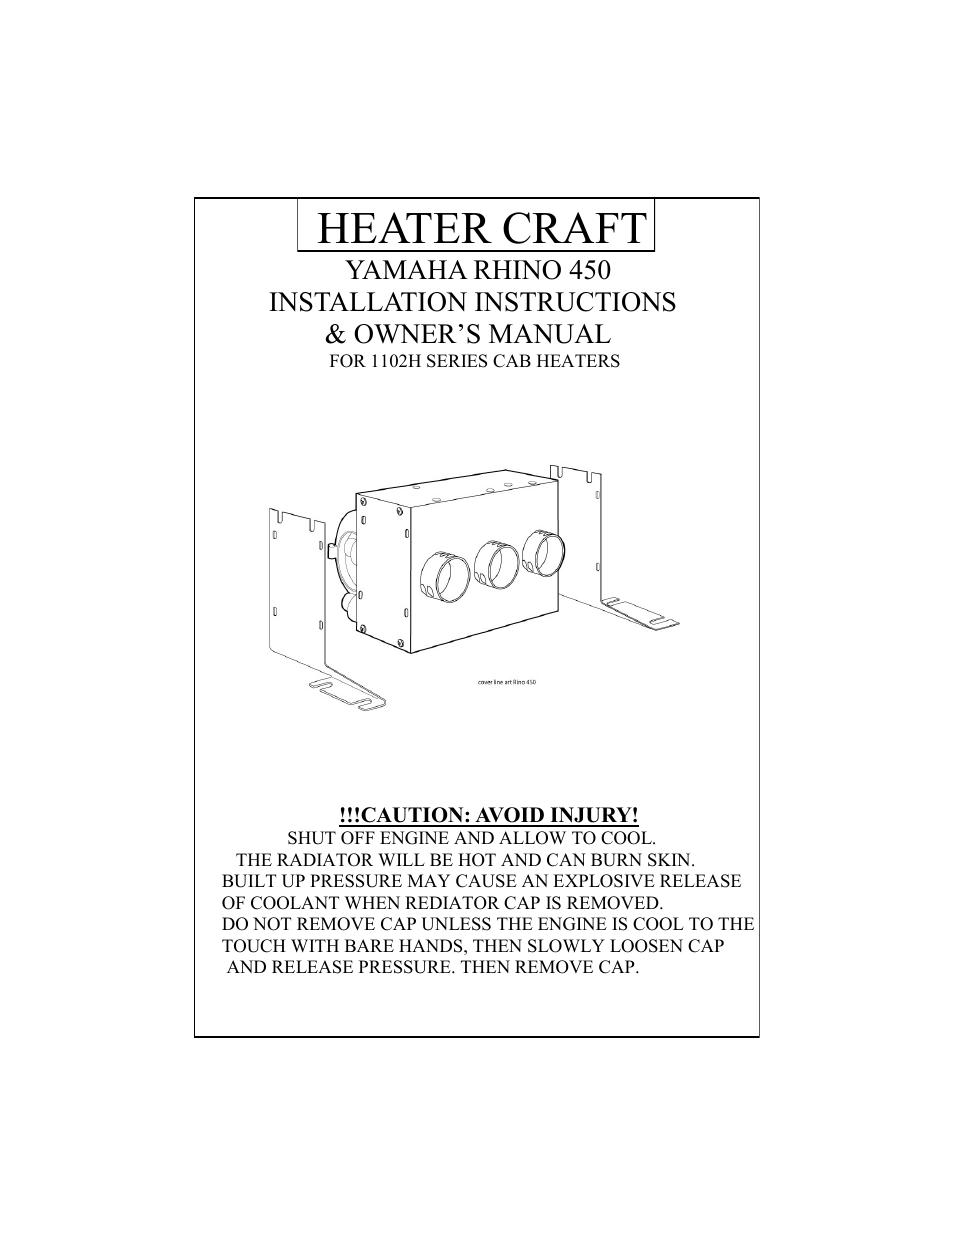 Heater Craft 450 Yamaha Rhino User Manual   7 pages